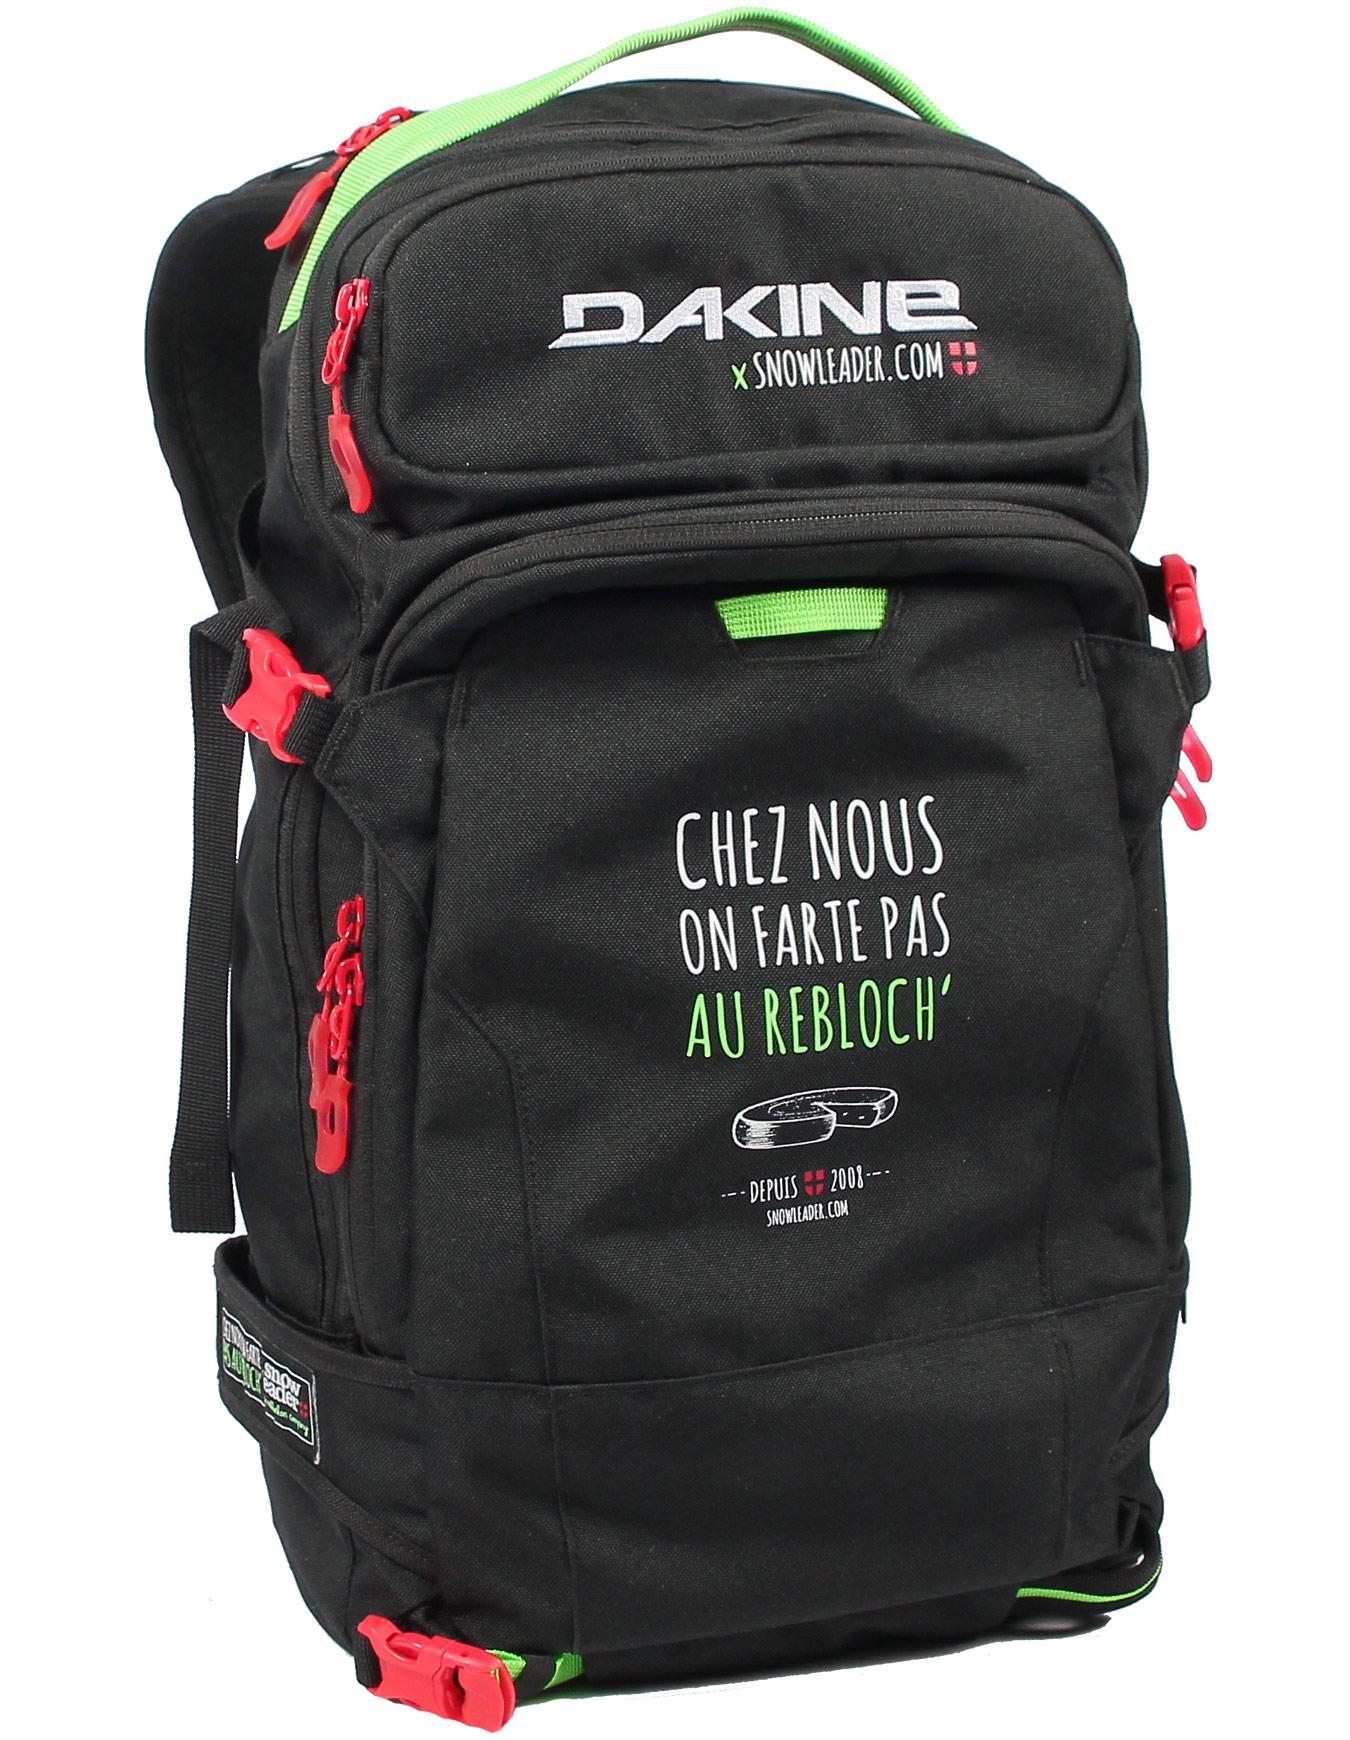 Dos Ski À DakineSacs Heli Pro 20l Snowleader Snowboard Nw80OPknX